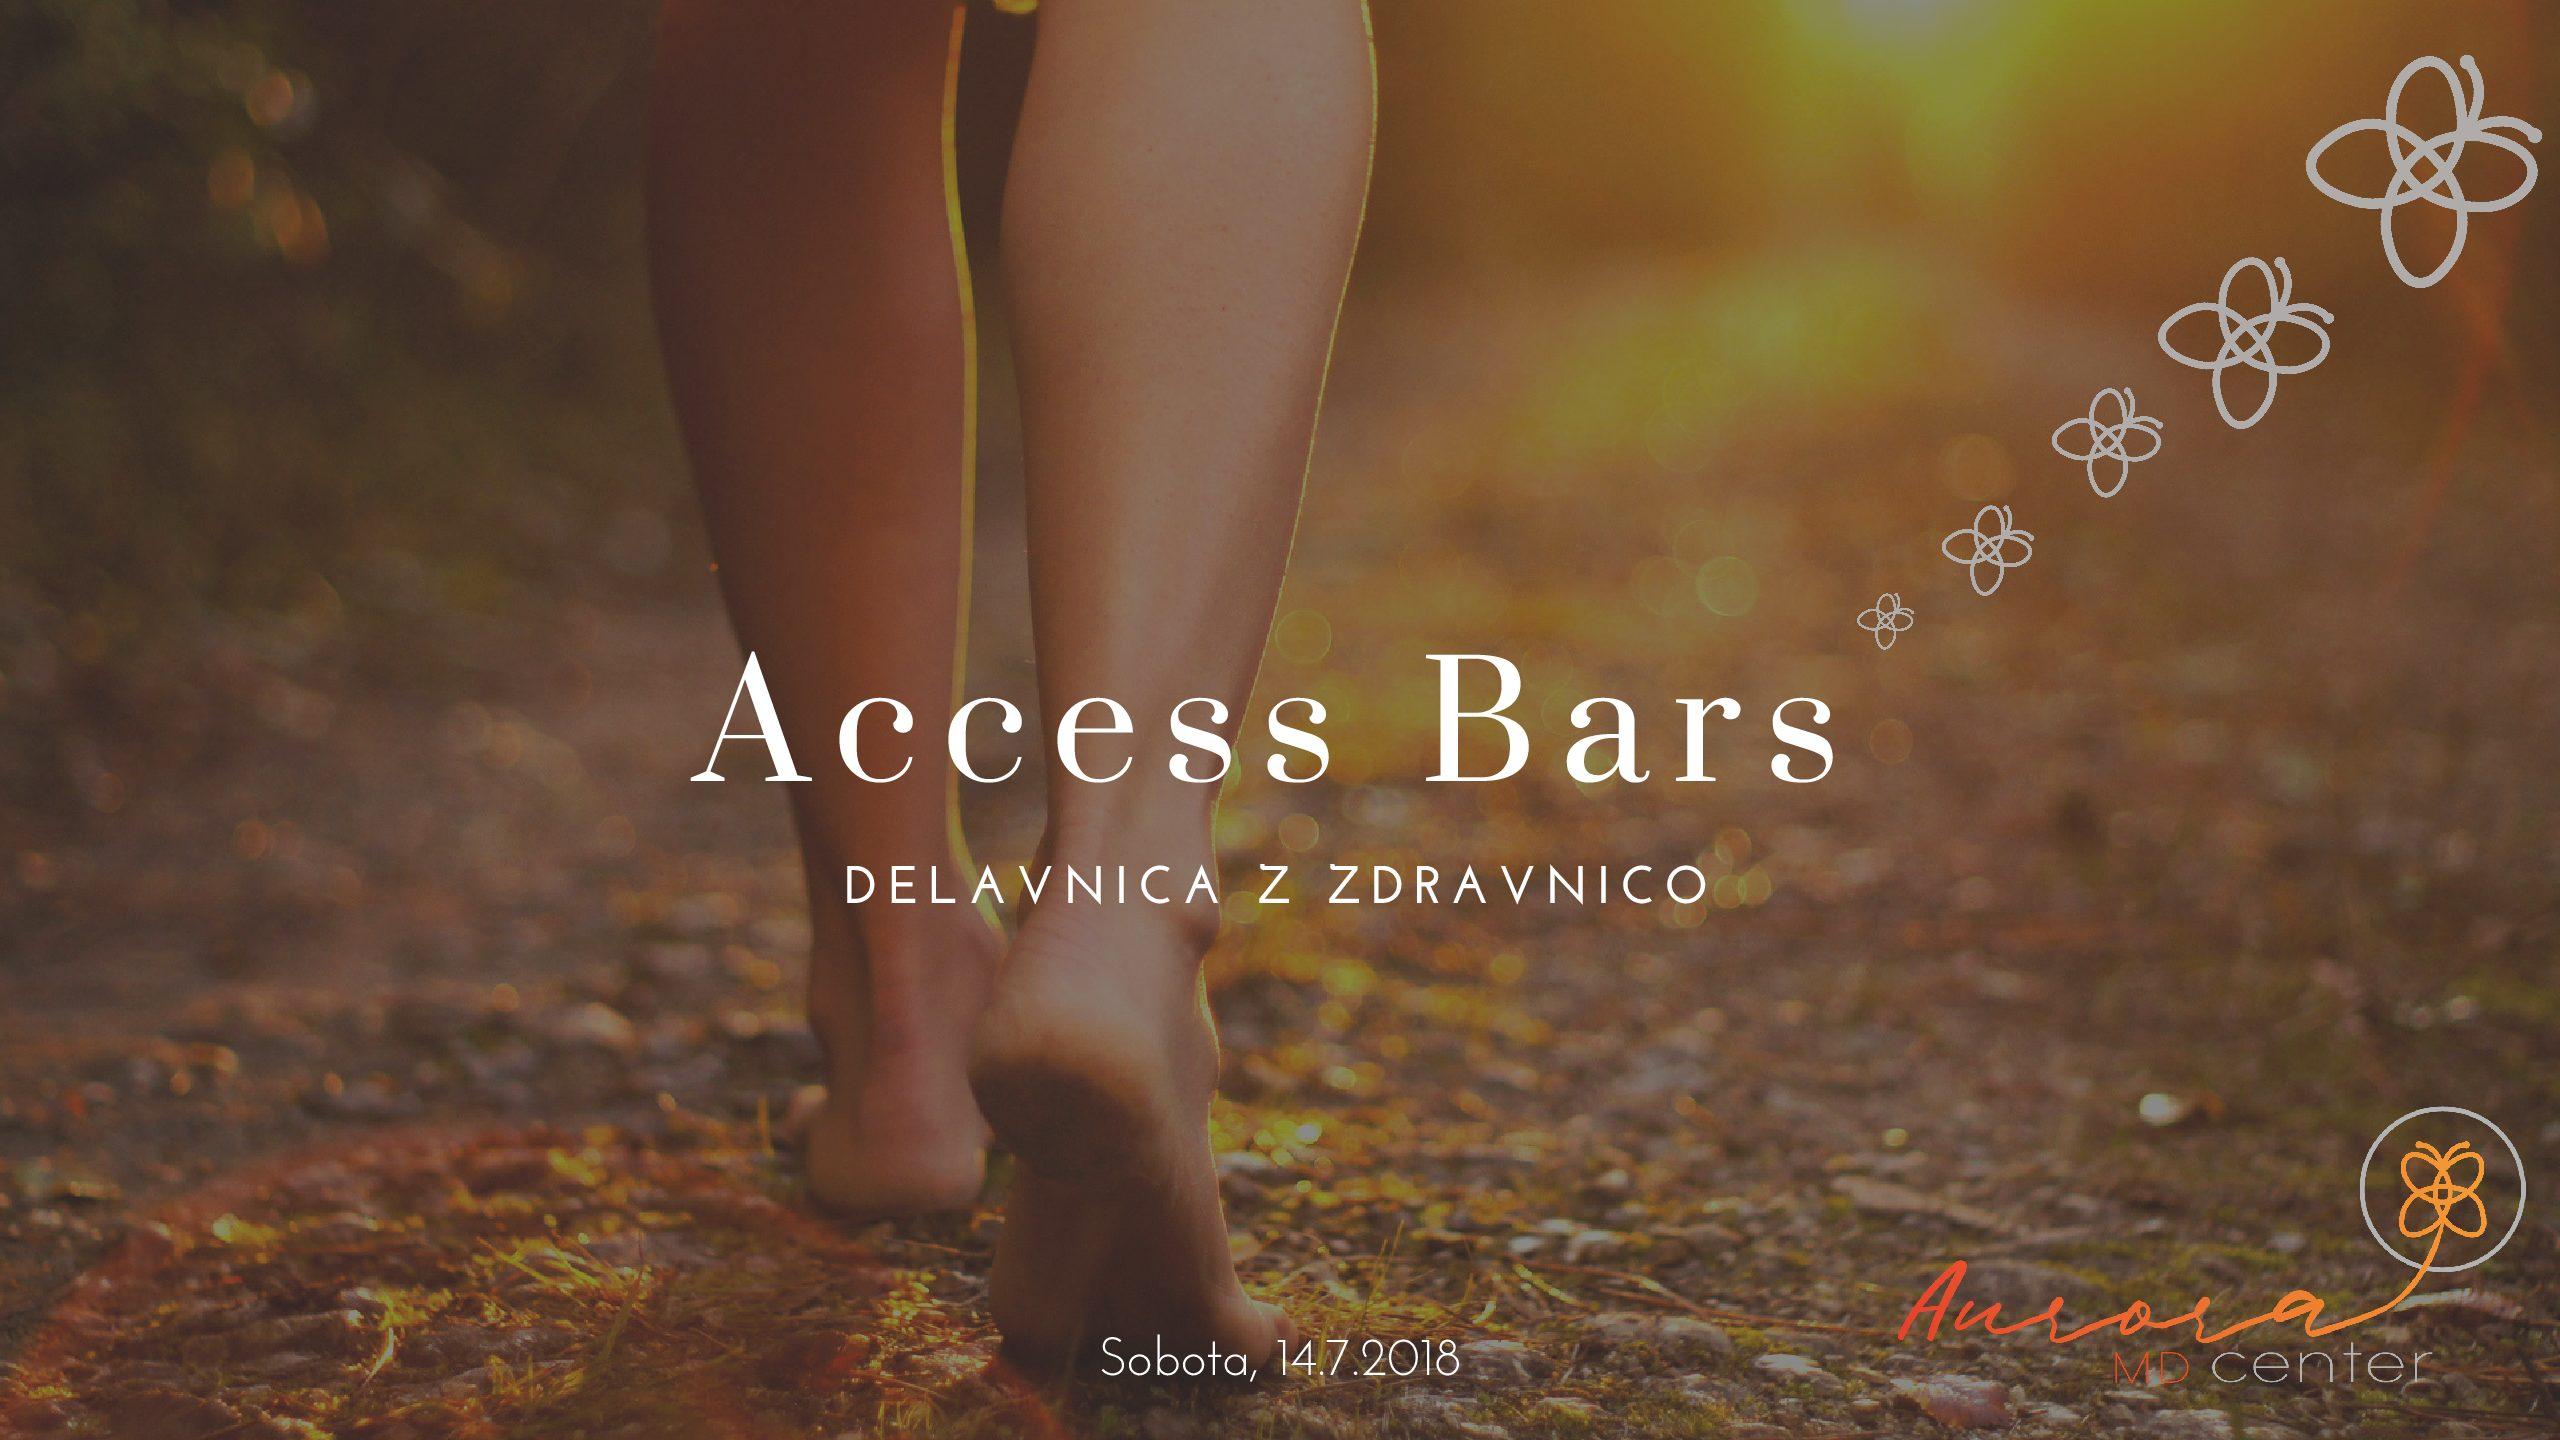 Access Bars Delavnica sobota 14. 7. 2018